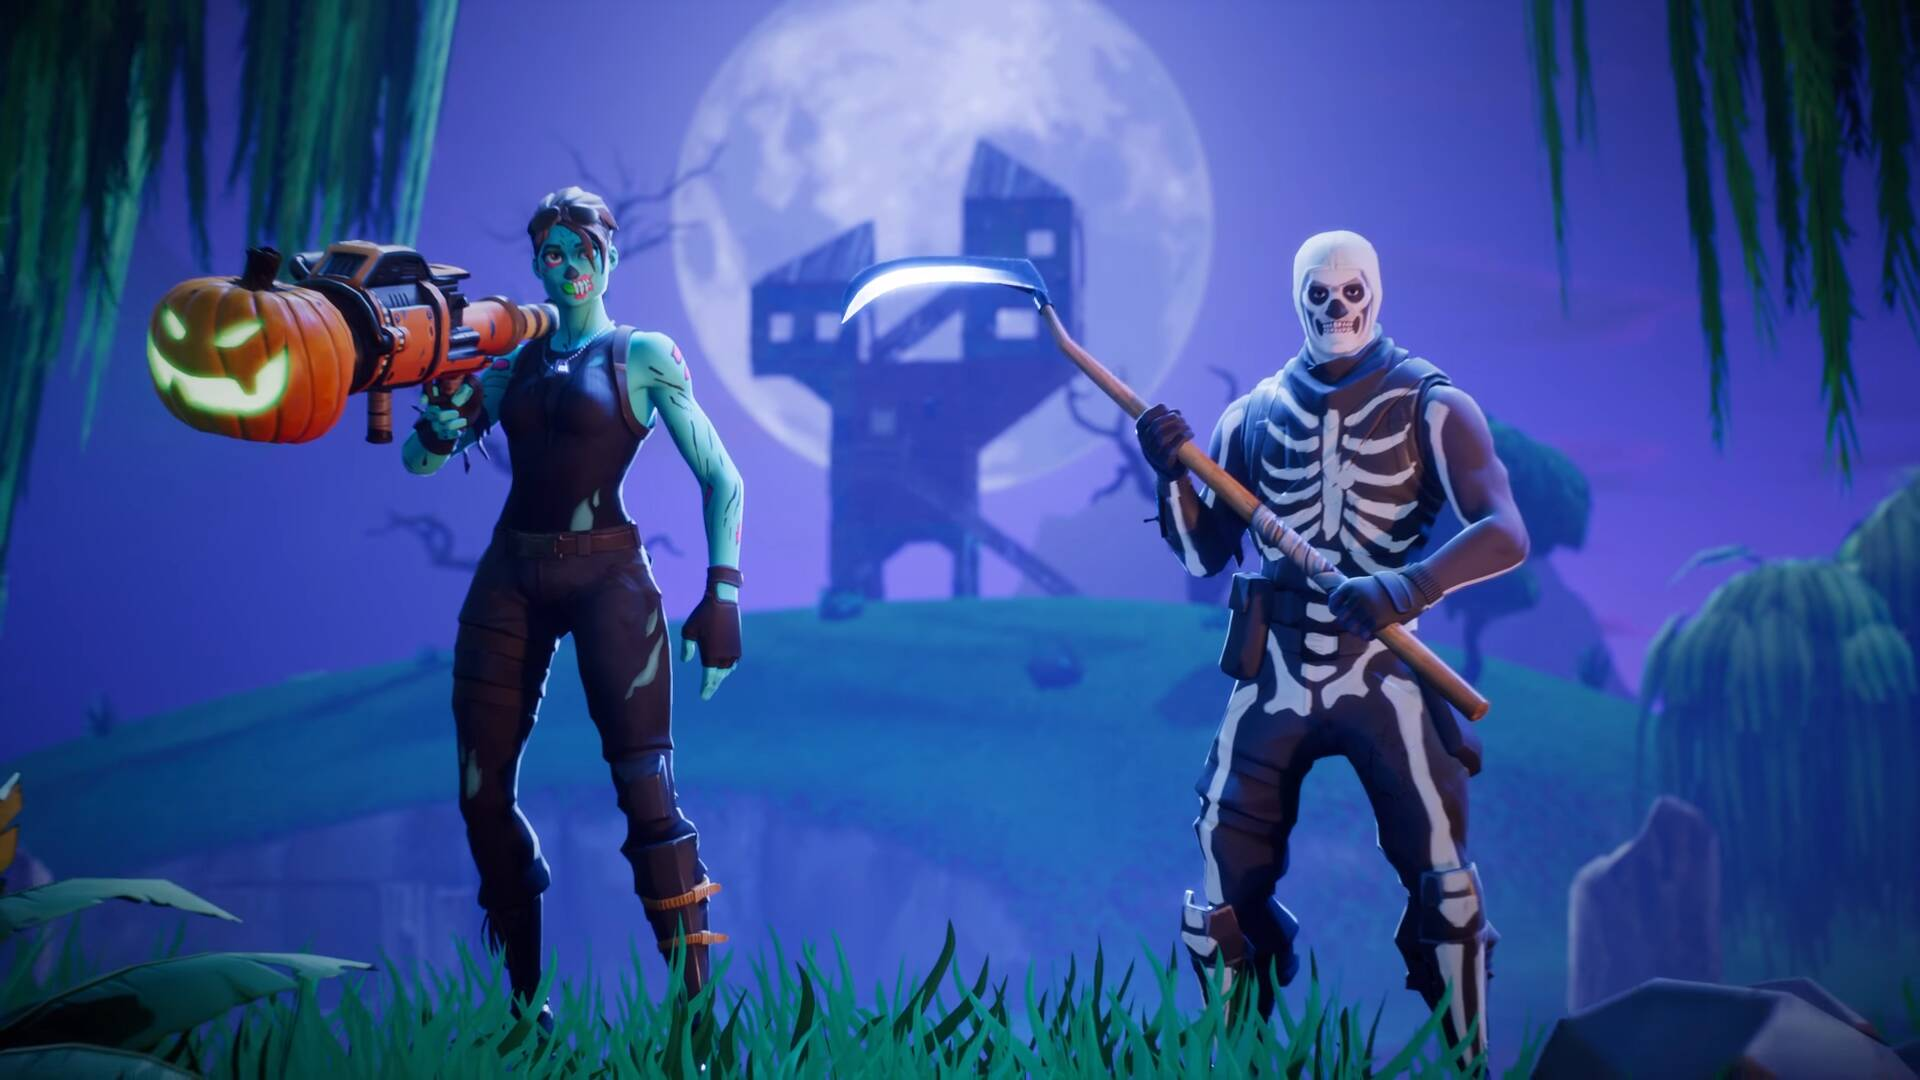 Fortnite Fortnitemares 2020 zombie